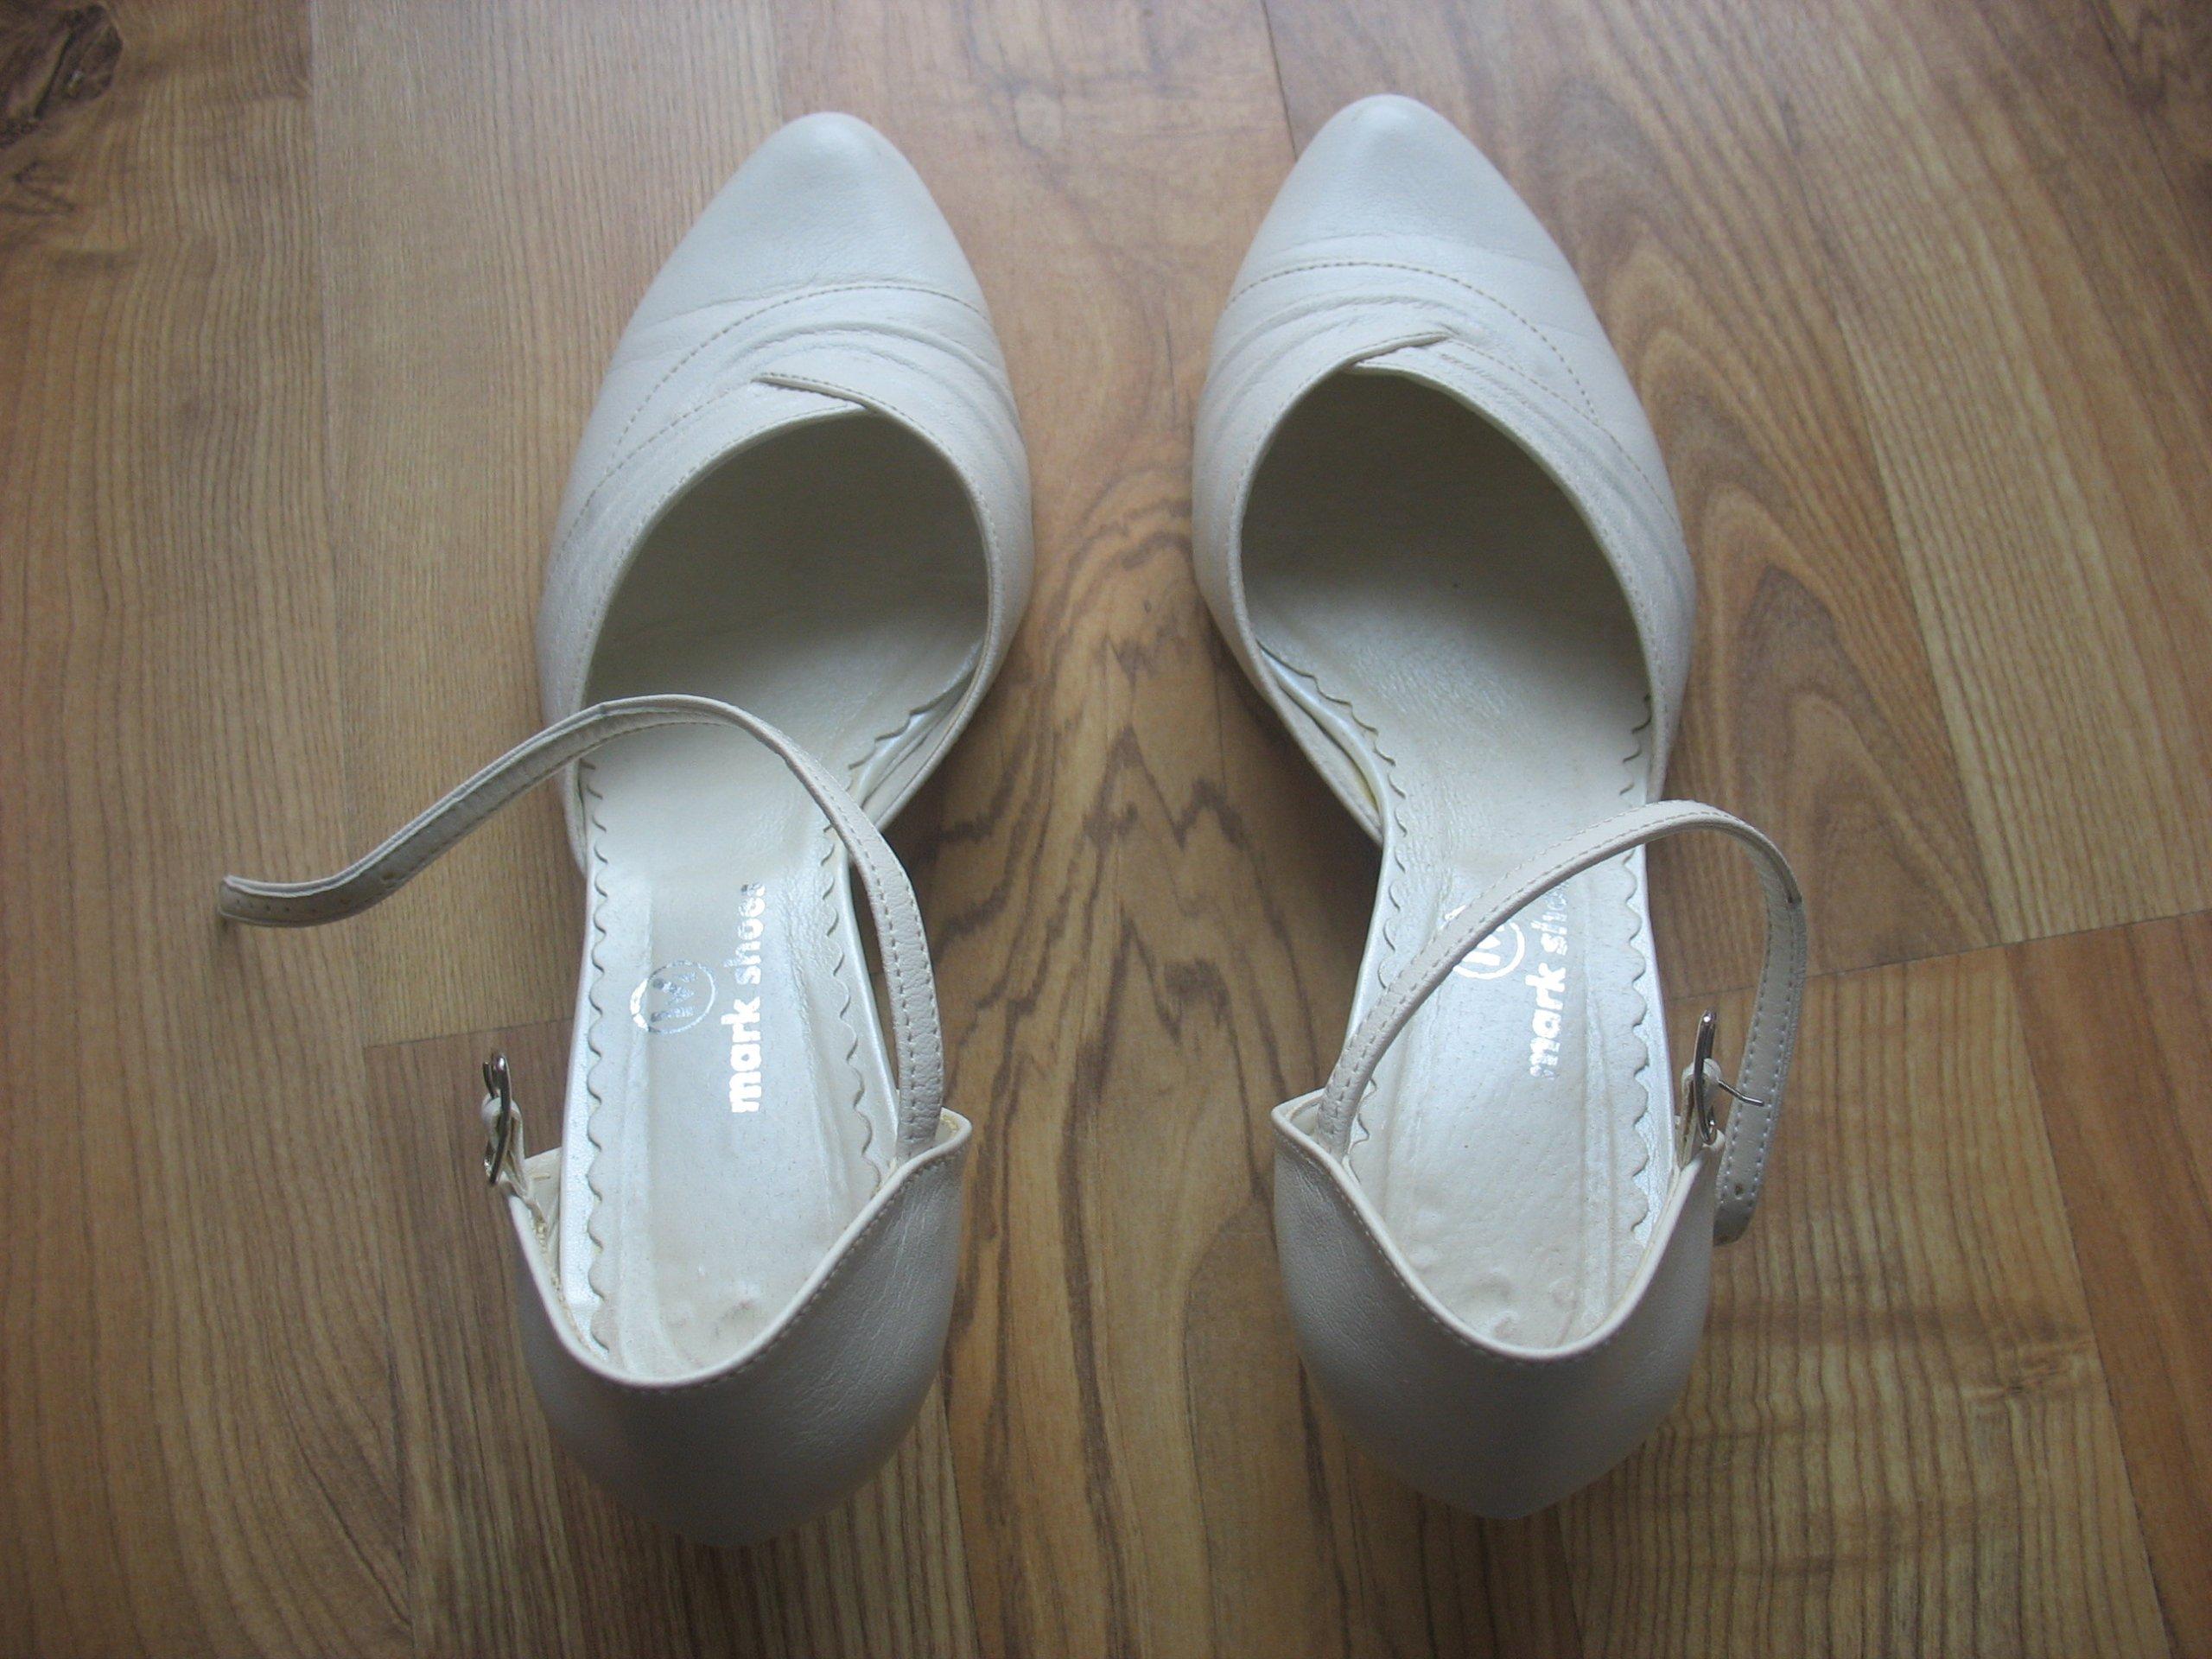 71a7b6f9 Buty ślubne Mark Shoes rozmiar 38, kolor ecru eko - 7320535834 ...